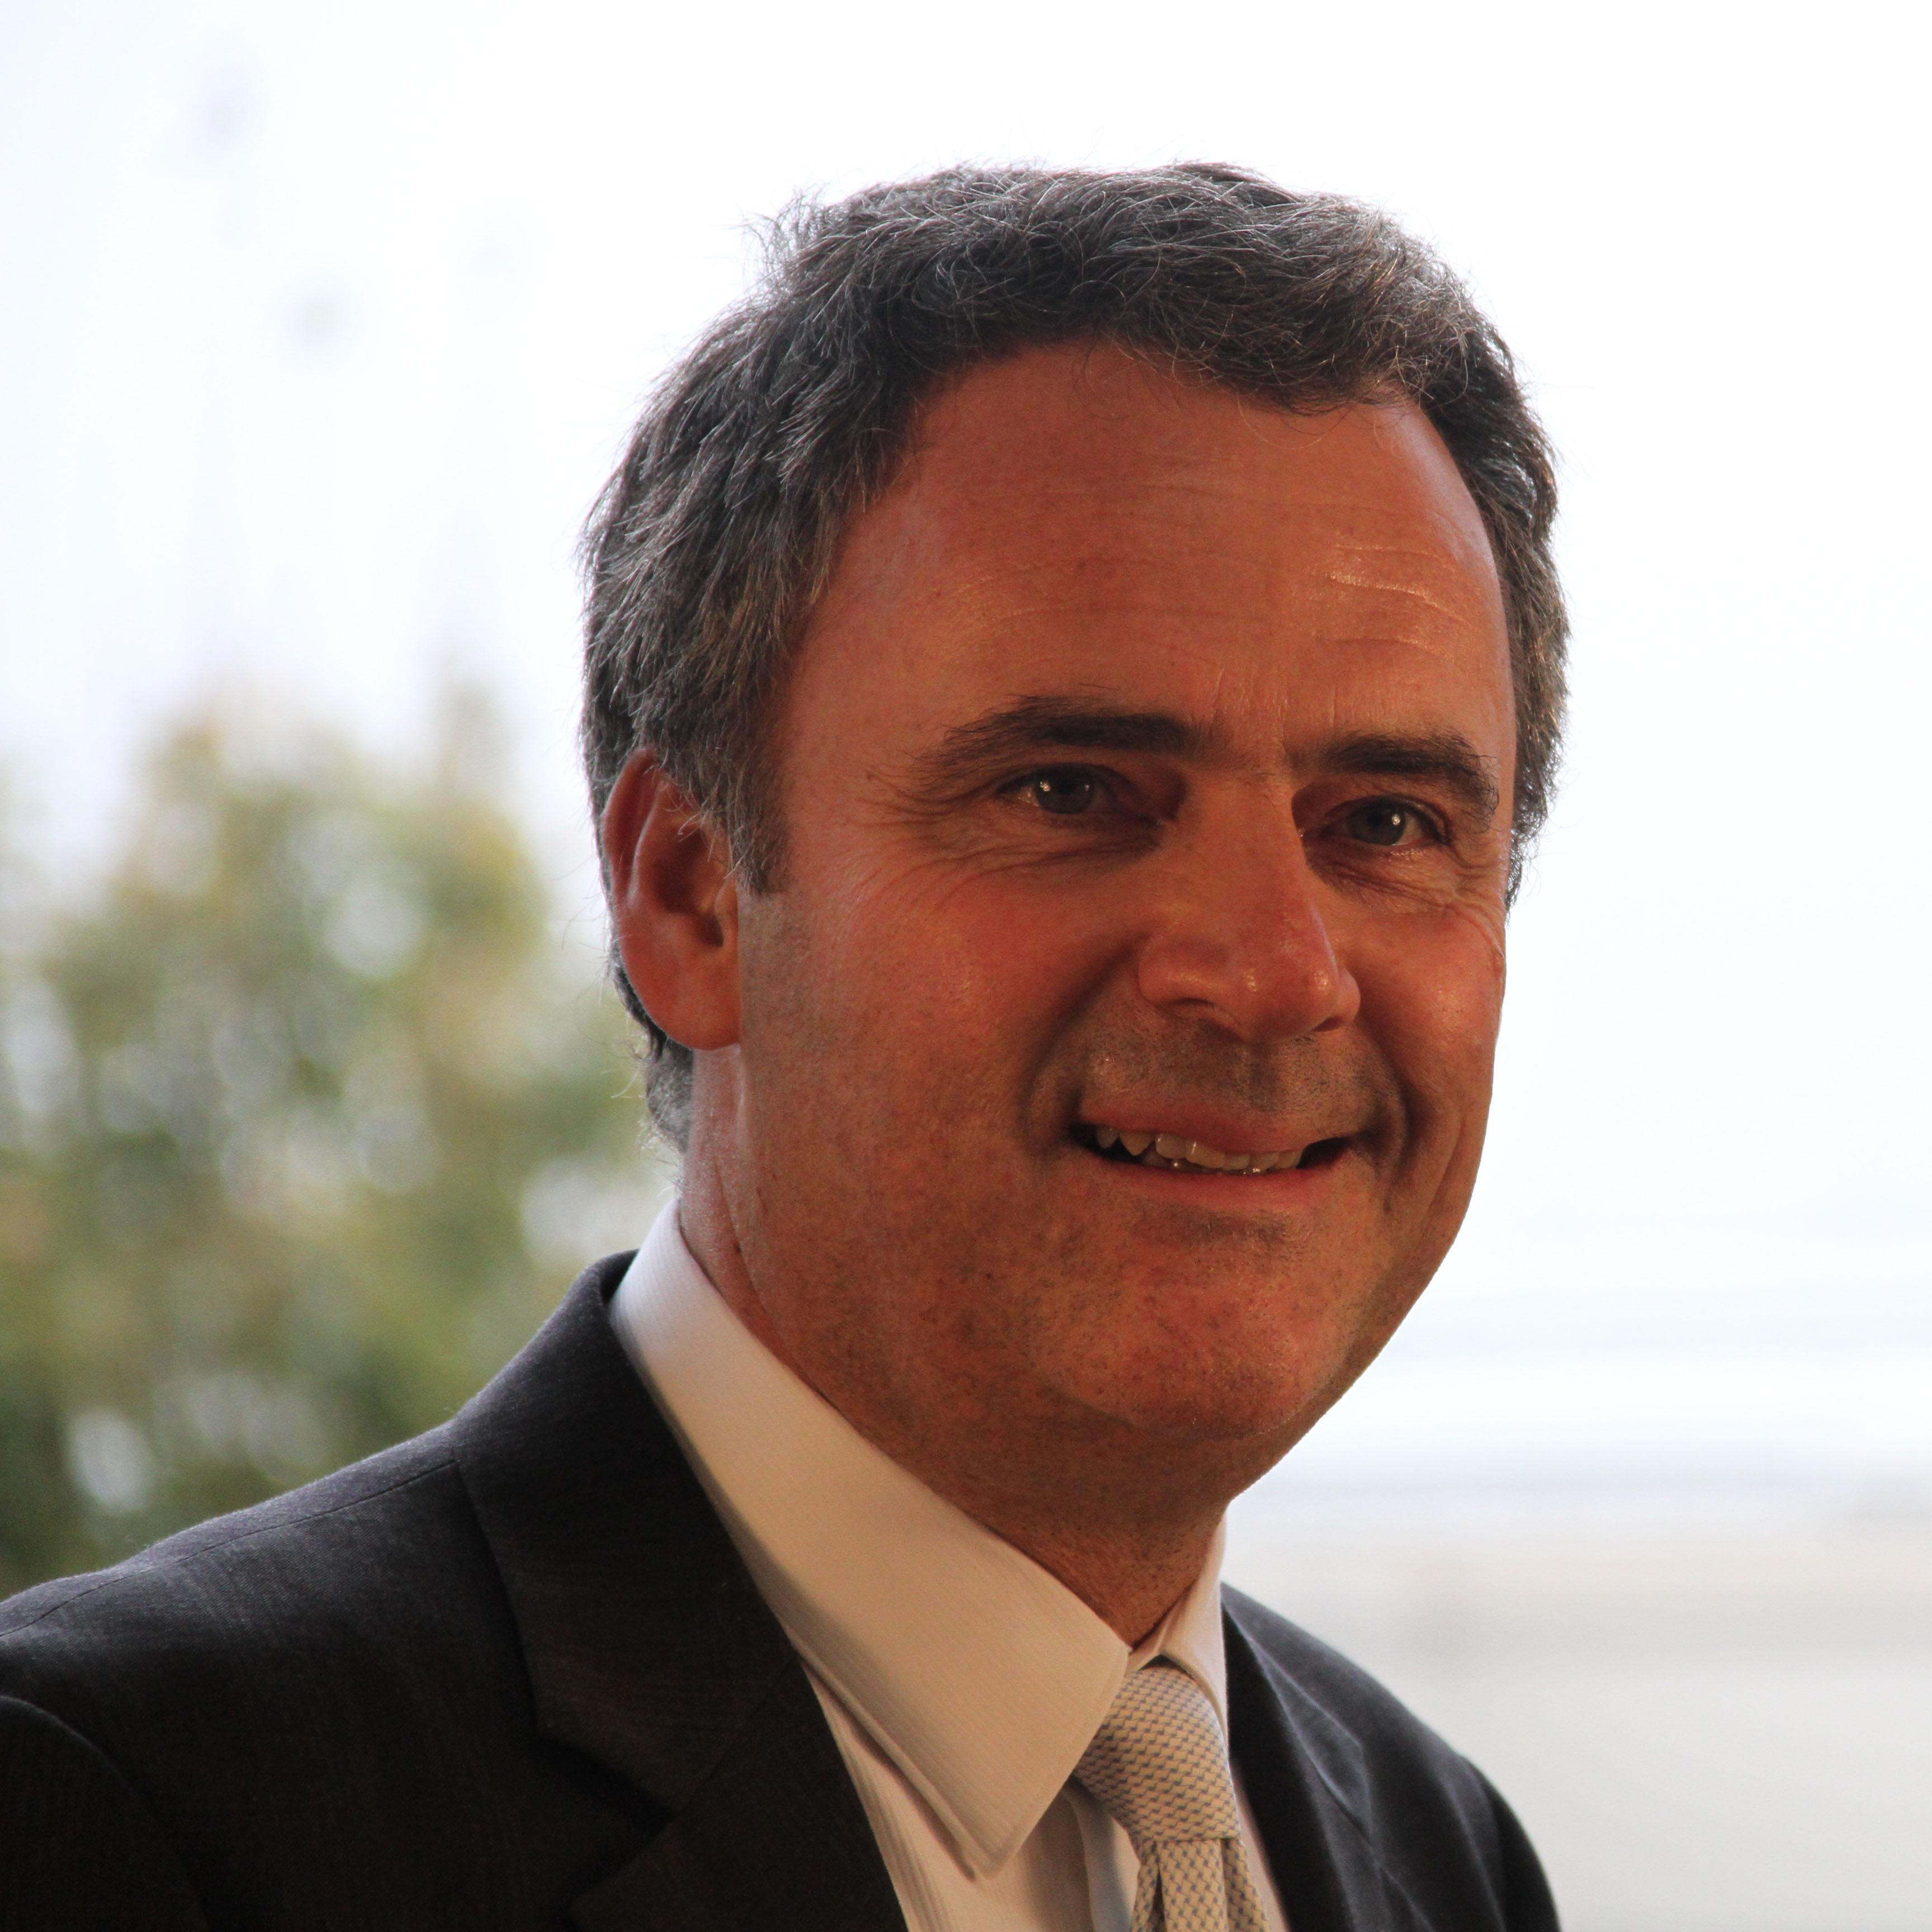 Olivier Derrien